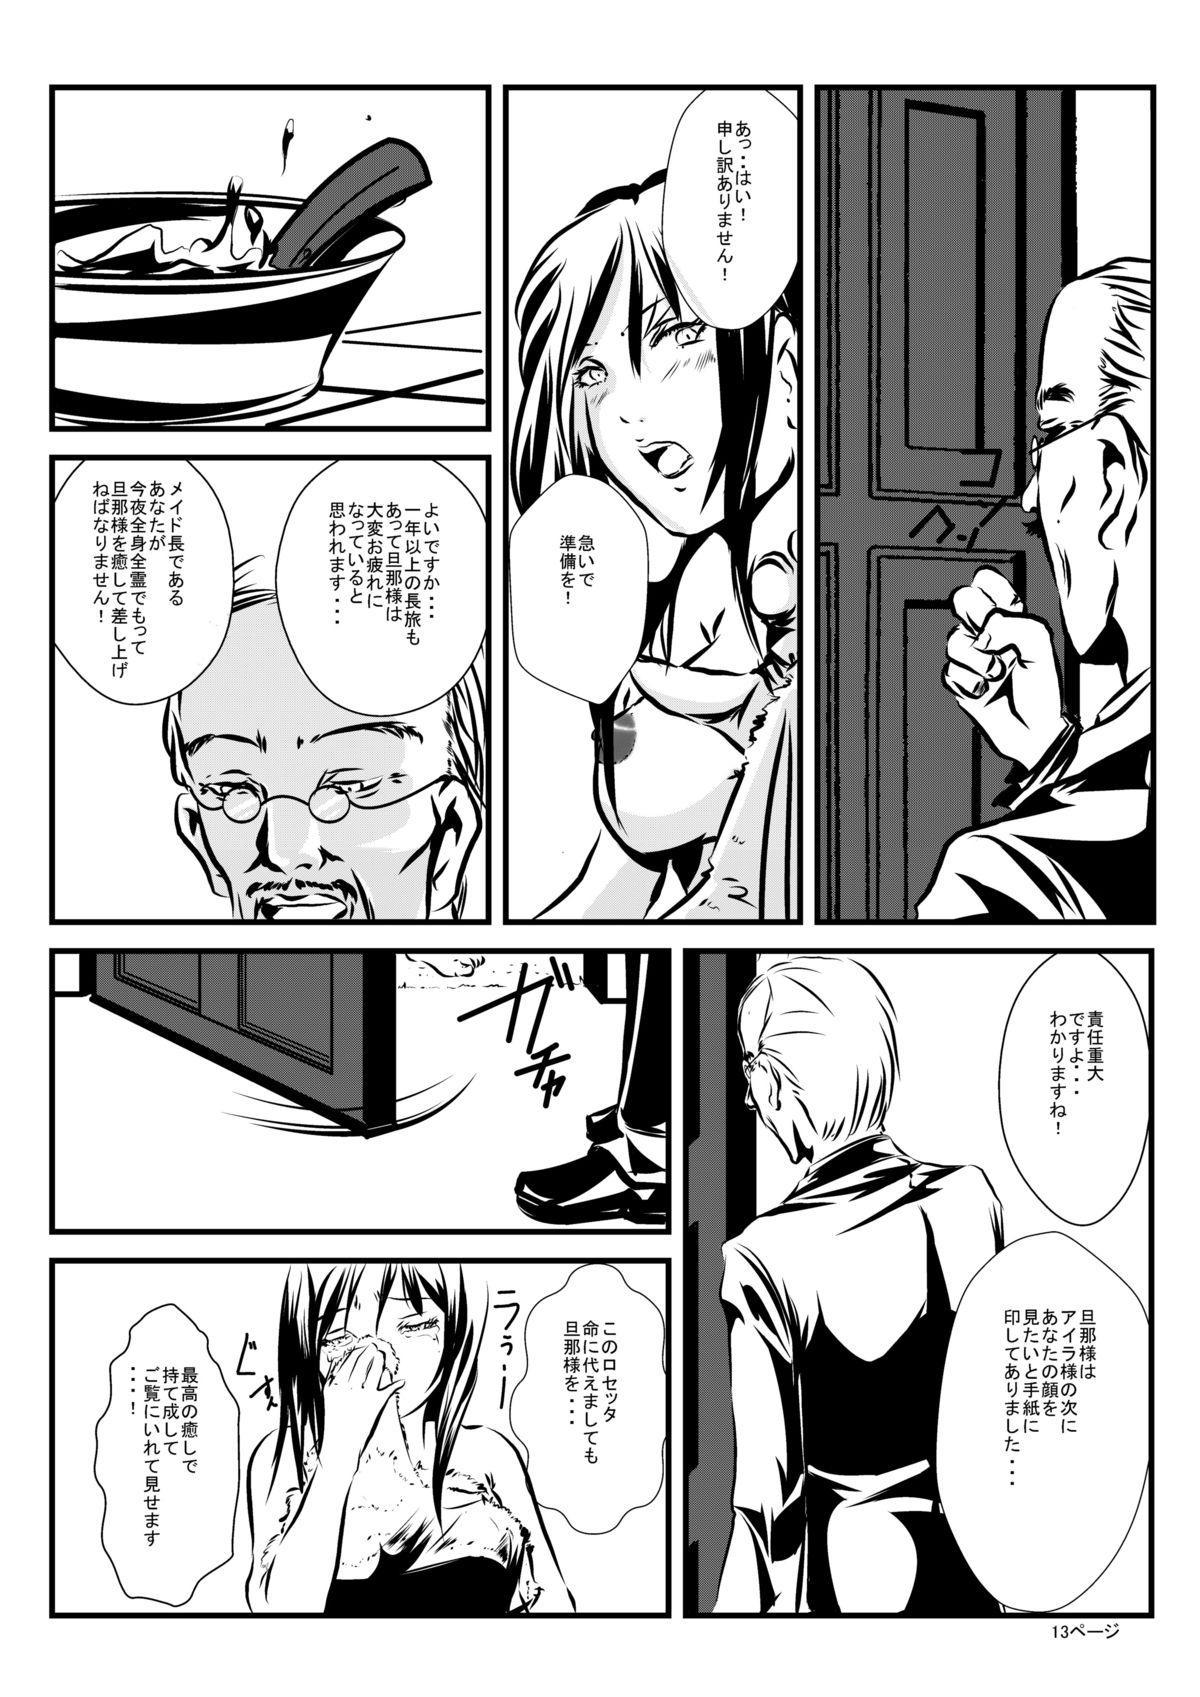 Loli Type no Jikkensitsu 11